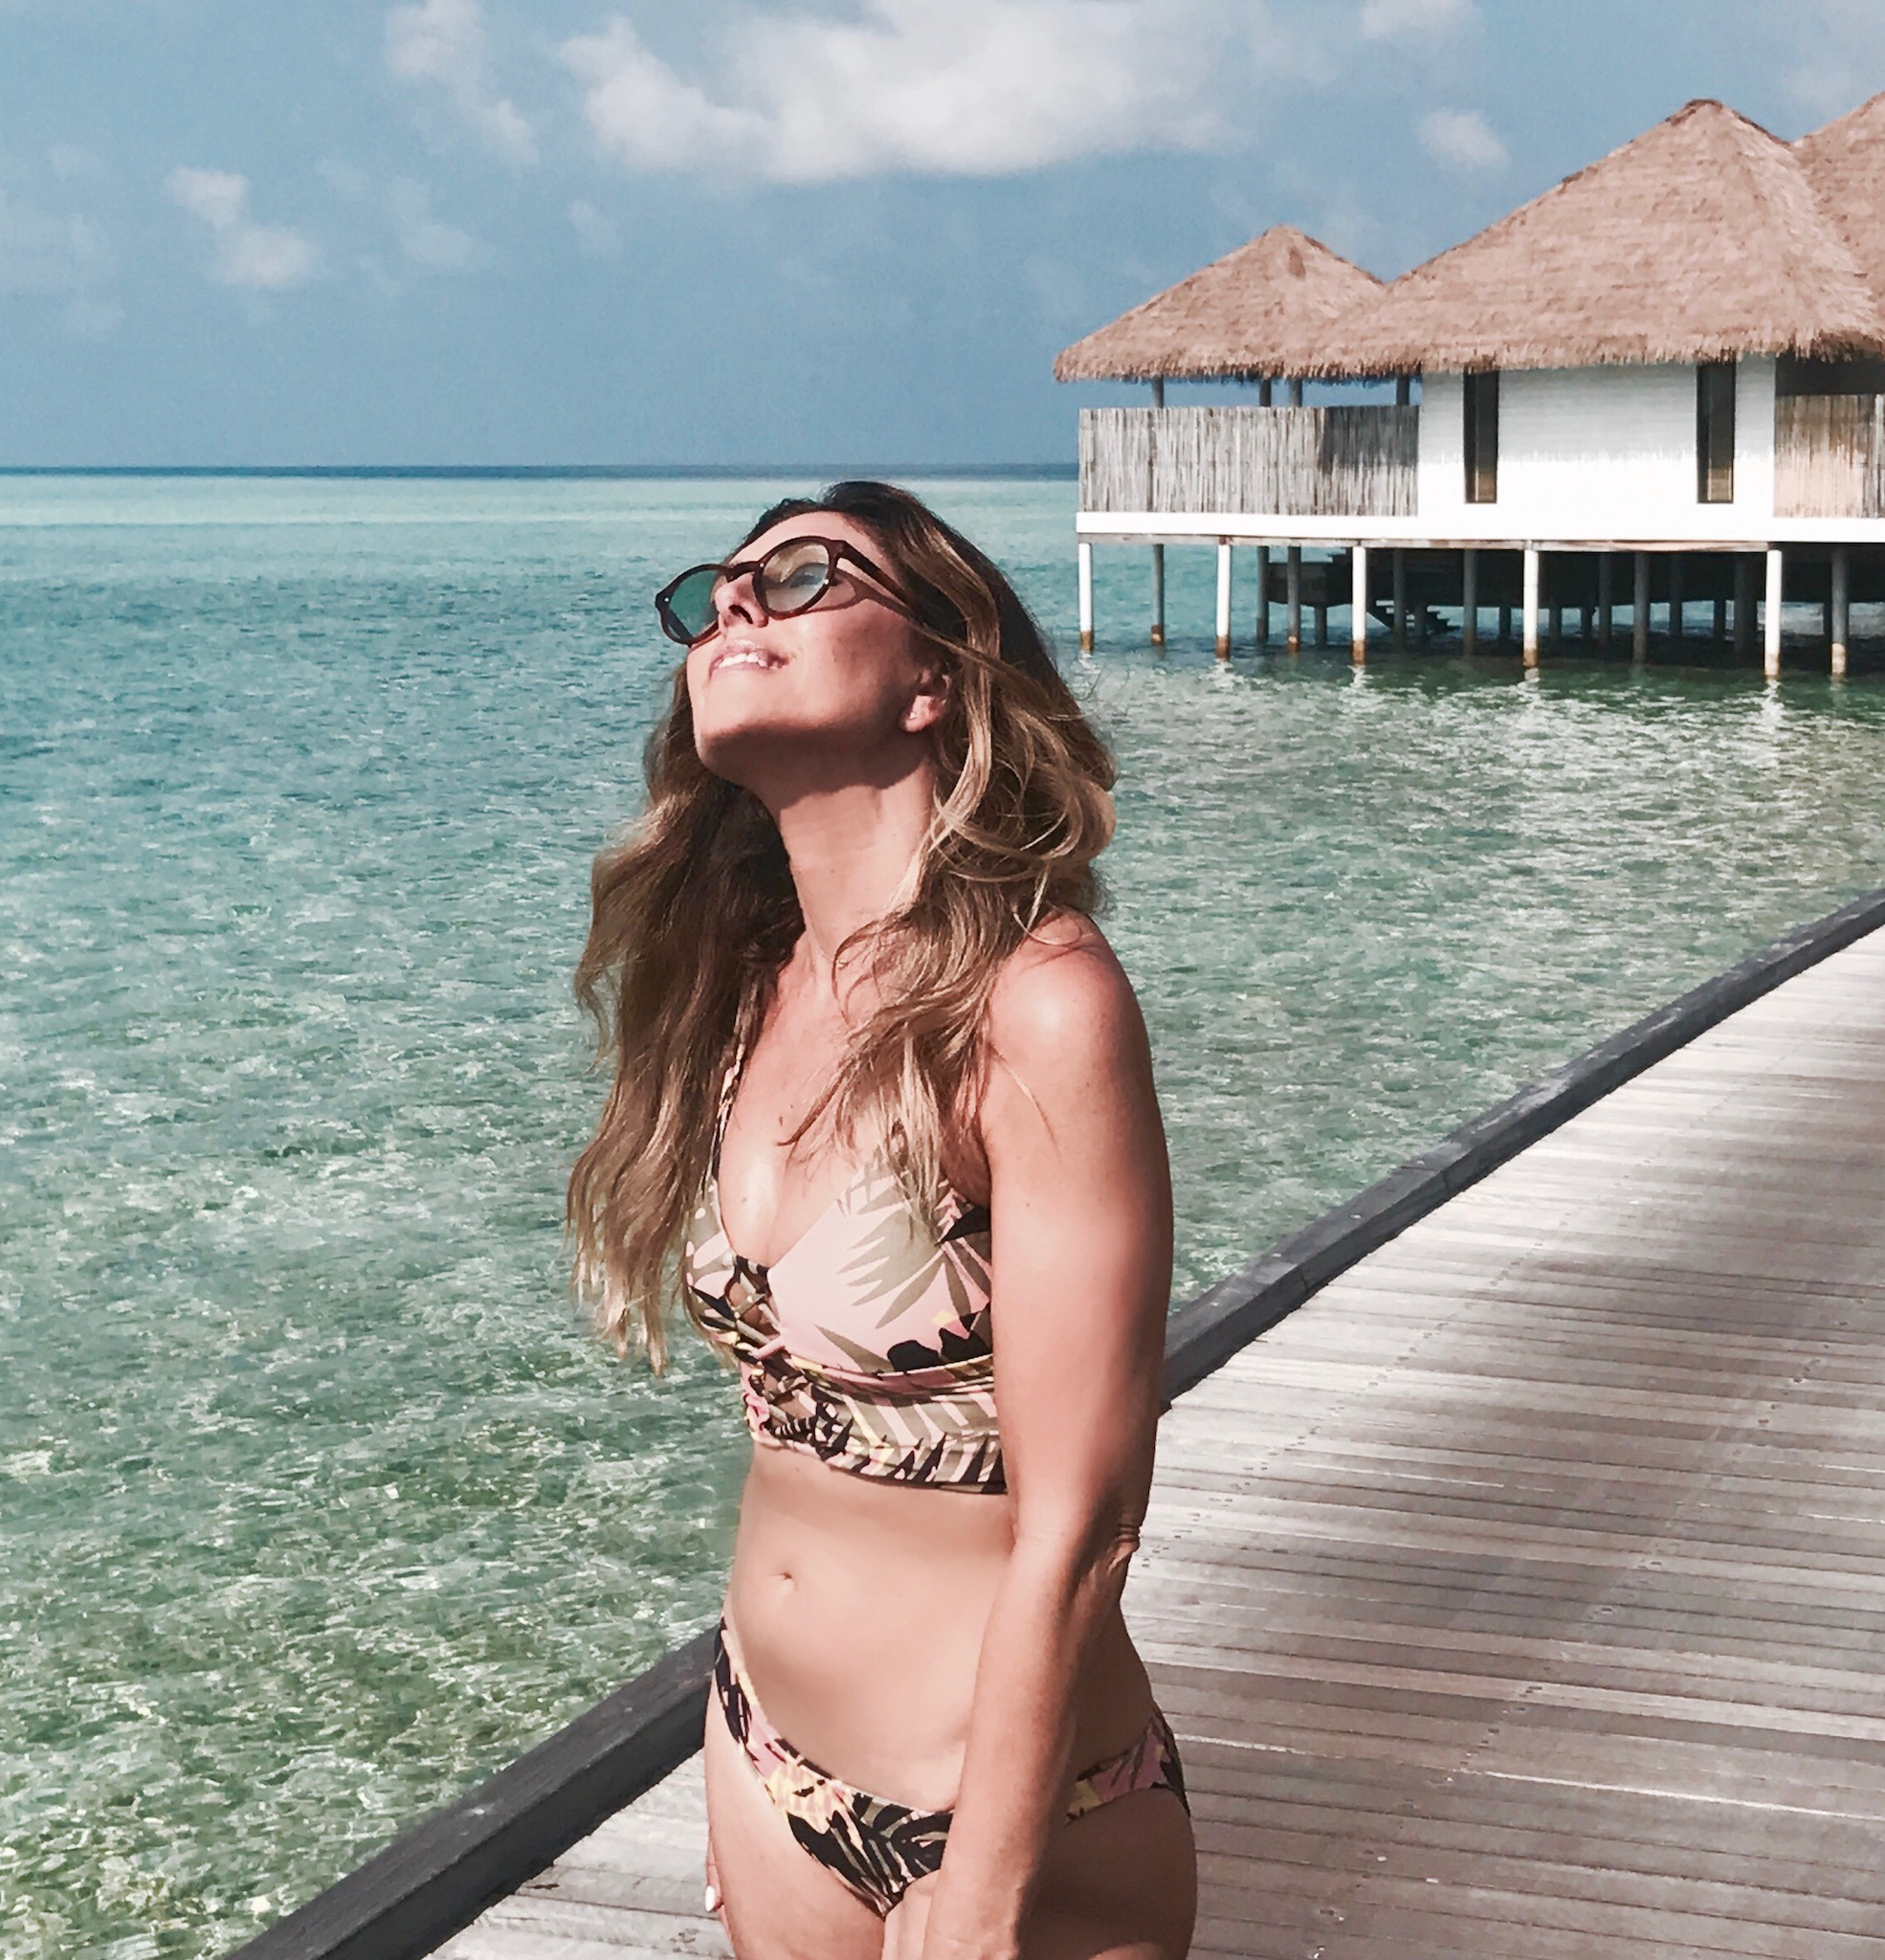 Melissa Meyers + sunscreen